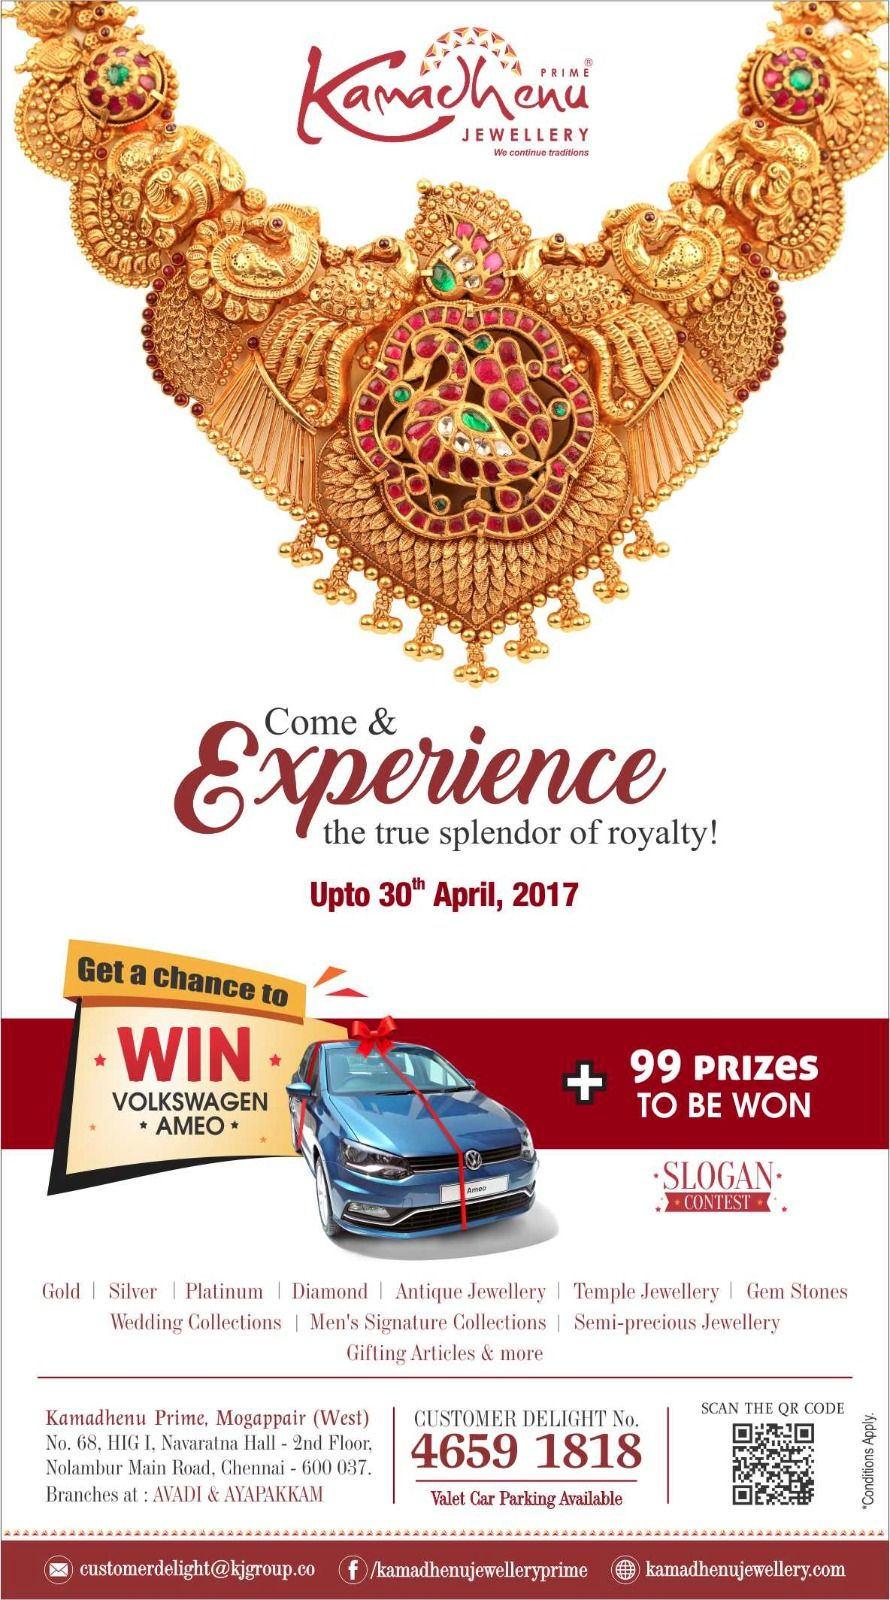 Kamathenu Jewellery AkshayaTritiya Offer Print Ad ...